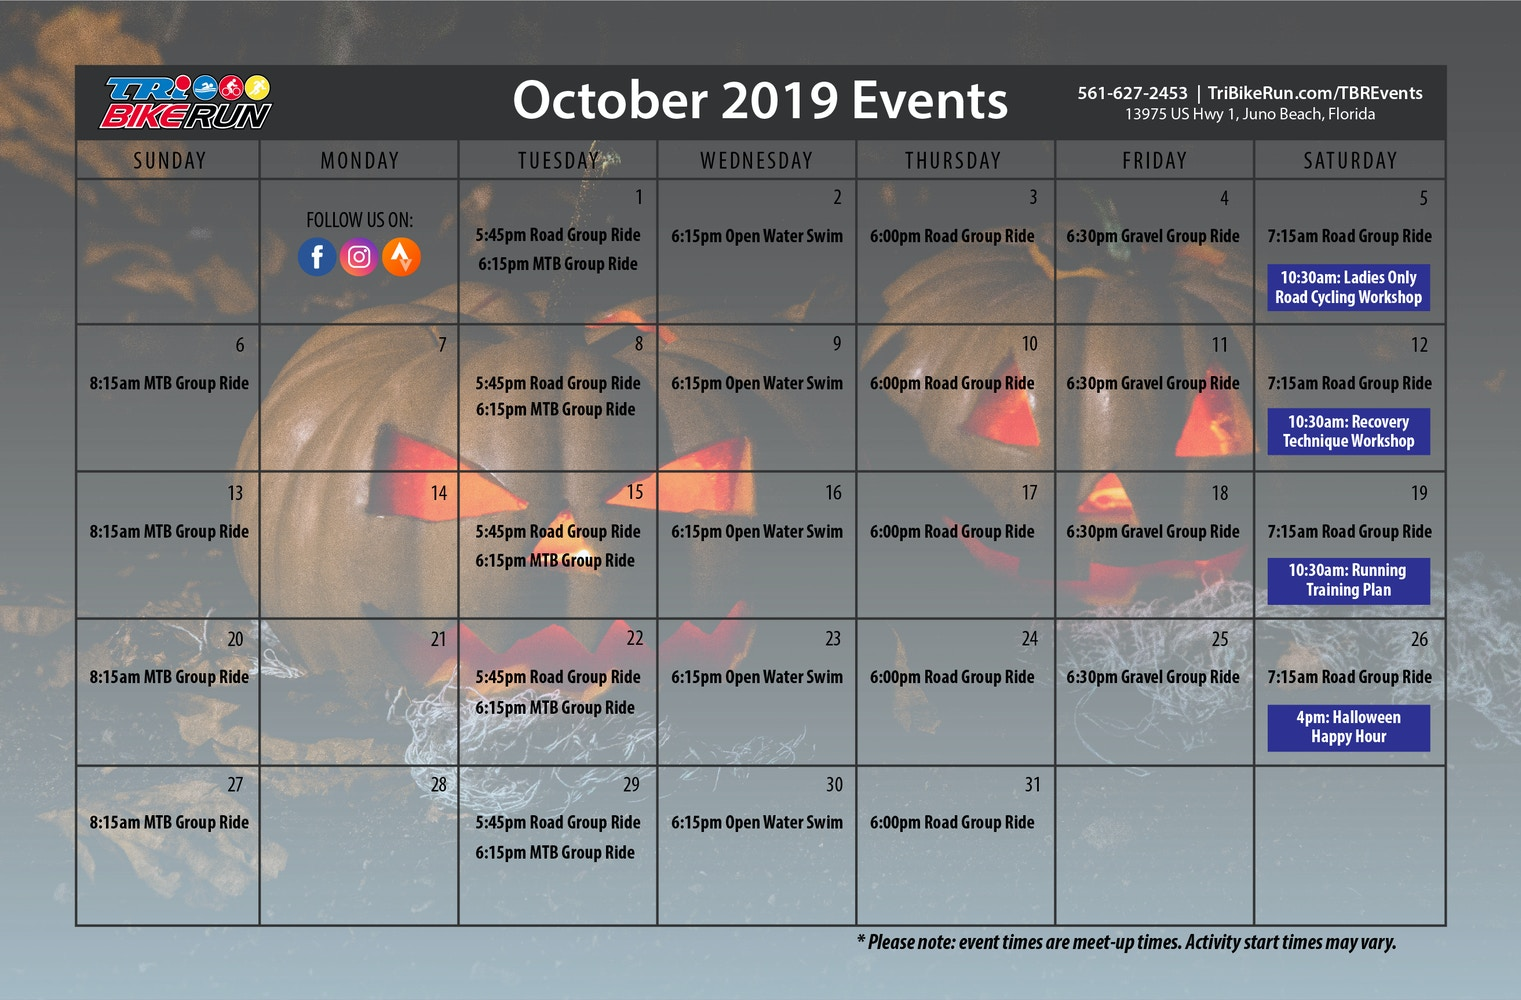 TBR Events Ocotober 2019